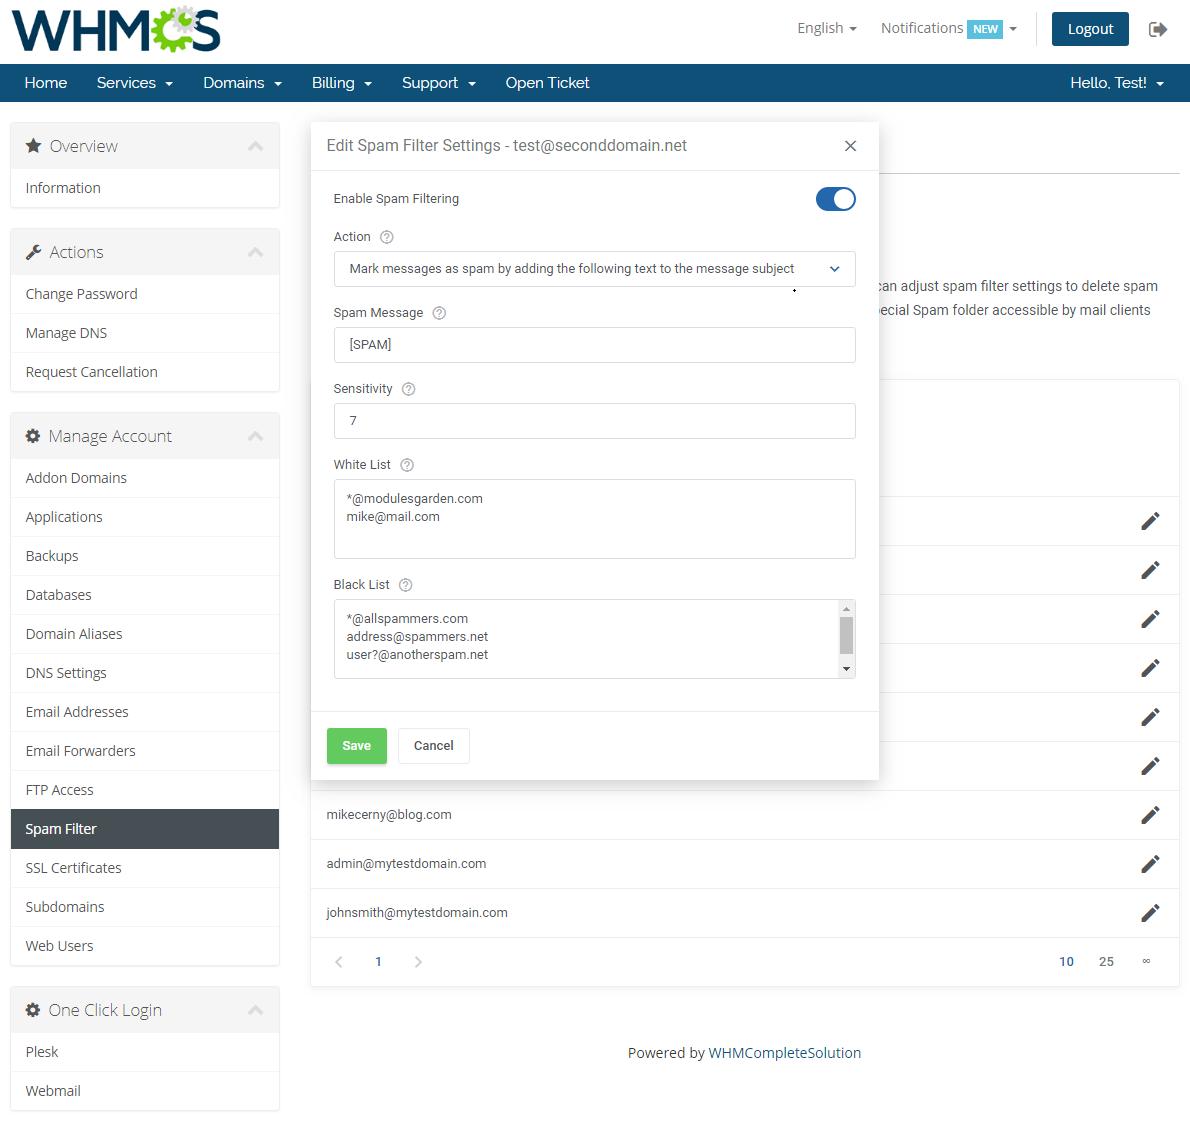 Plesk Extended For WHMCS: Screen 13